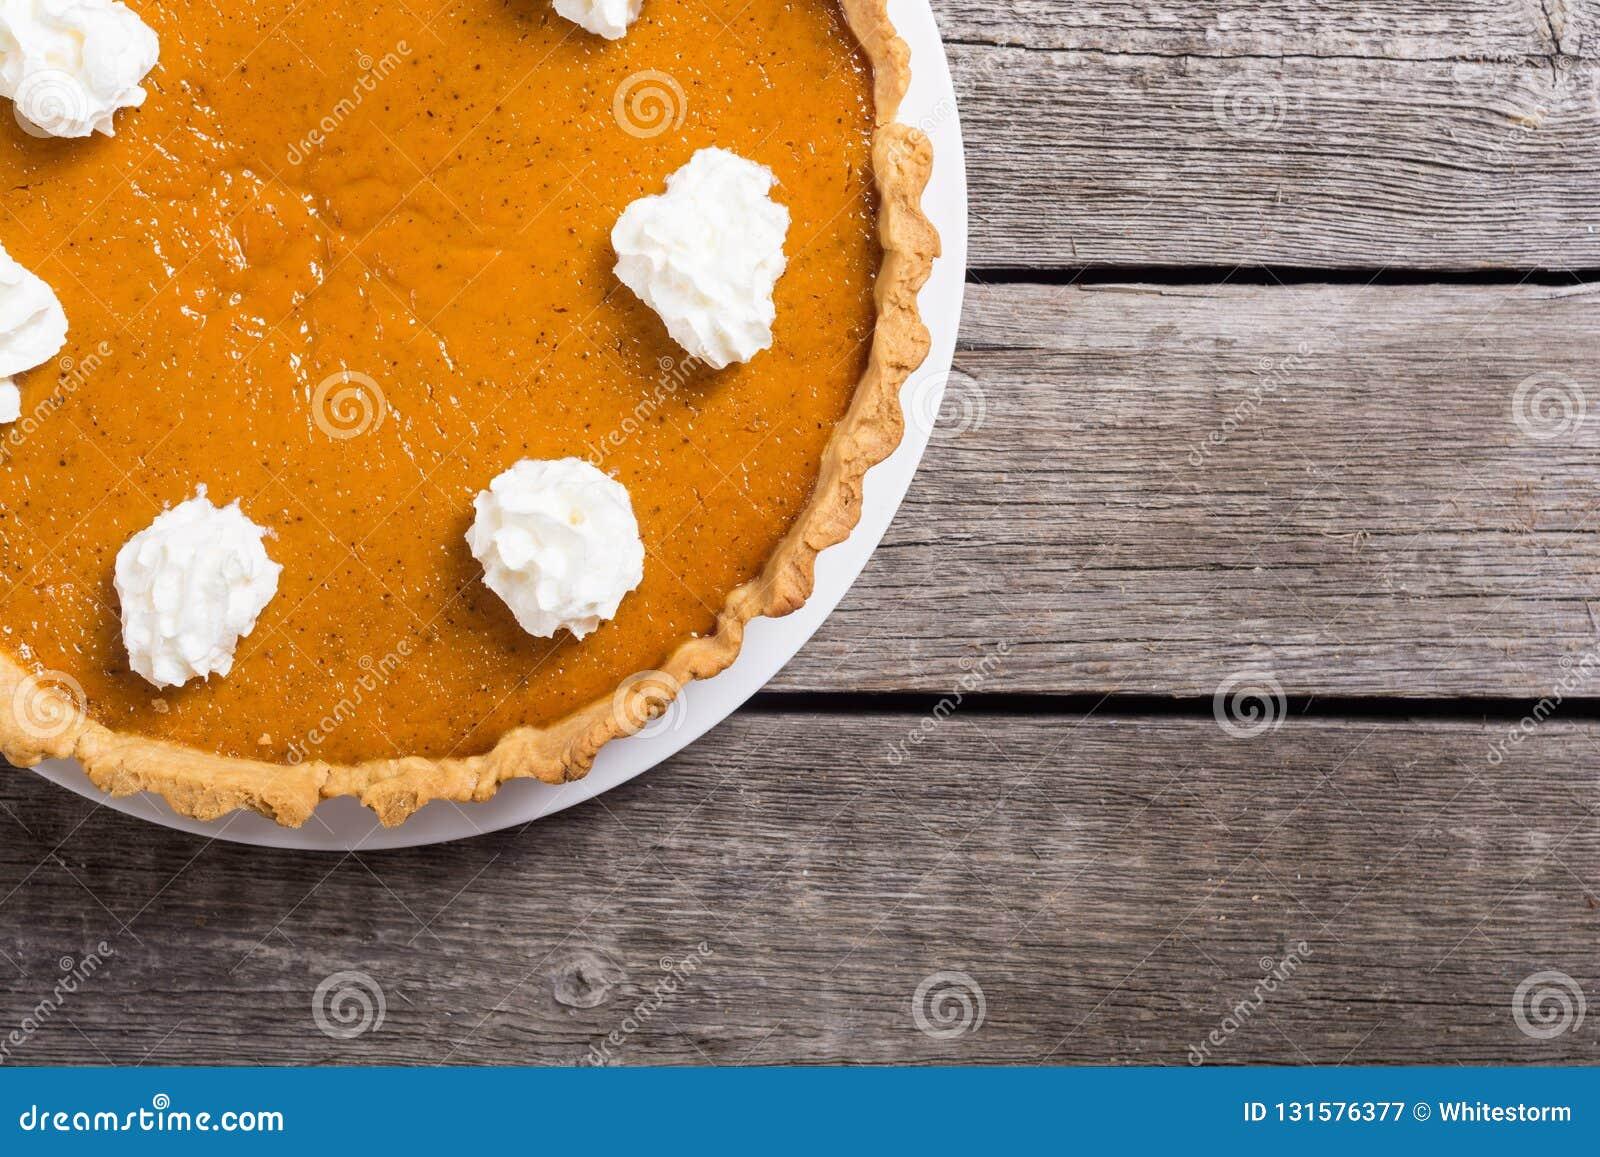 Homemade american traditional pumpkin pie Autumn food background